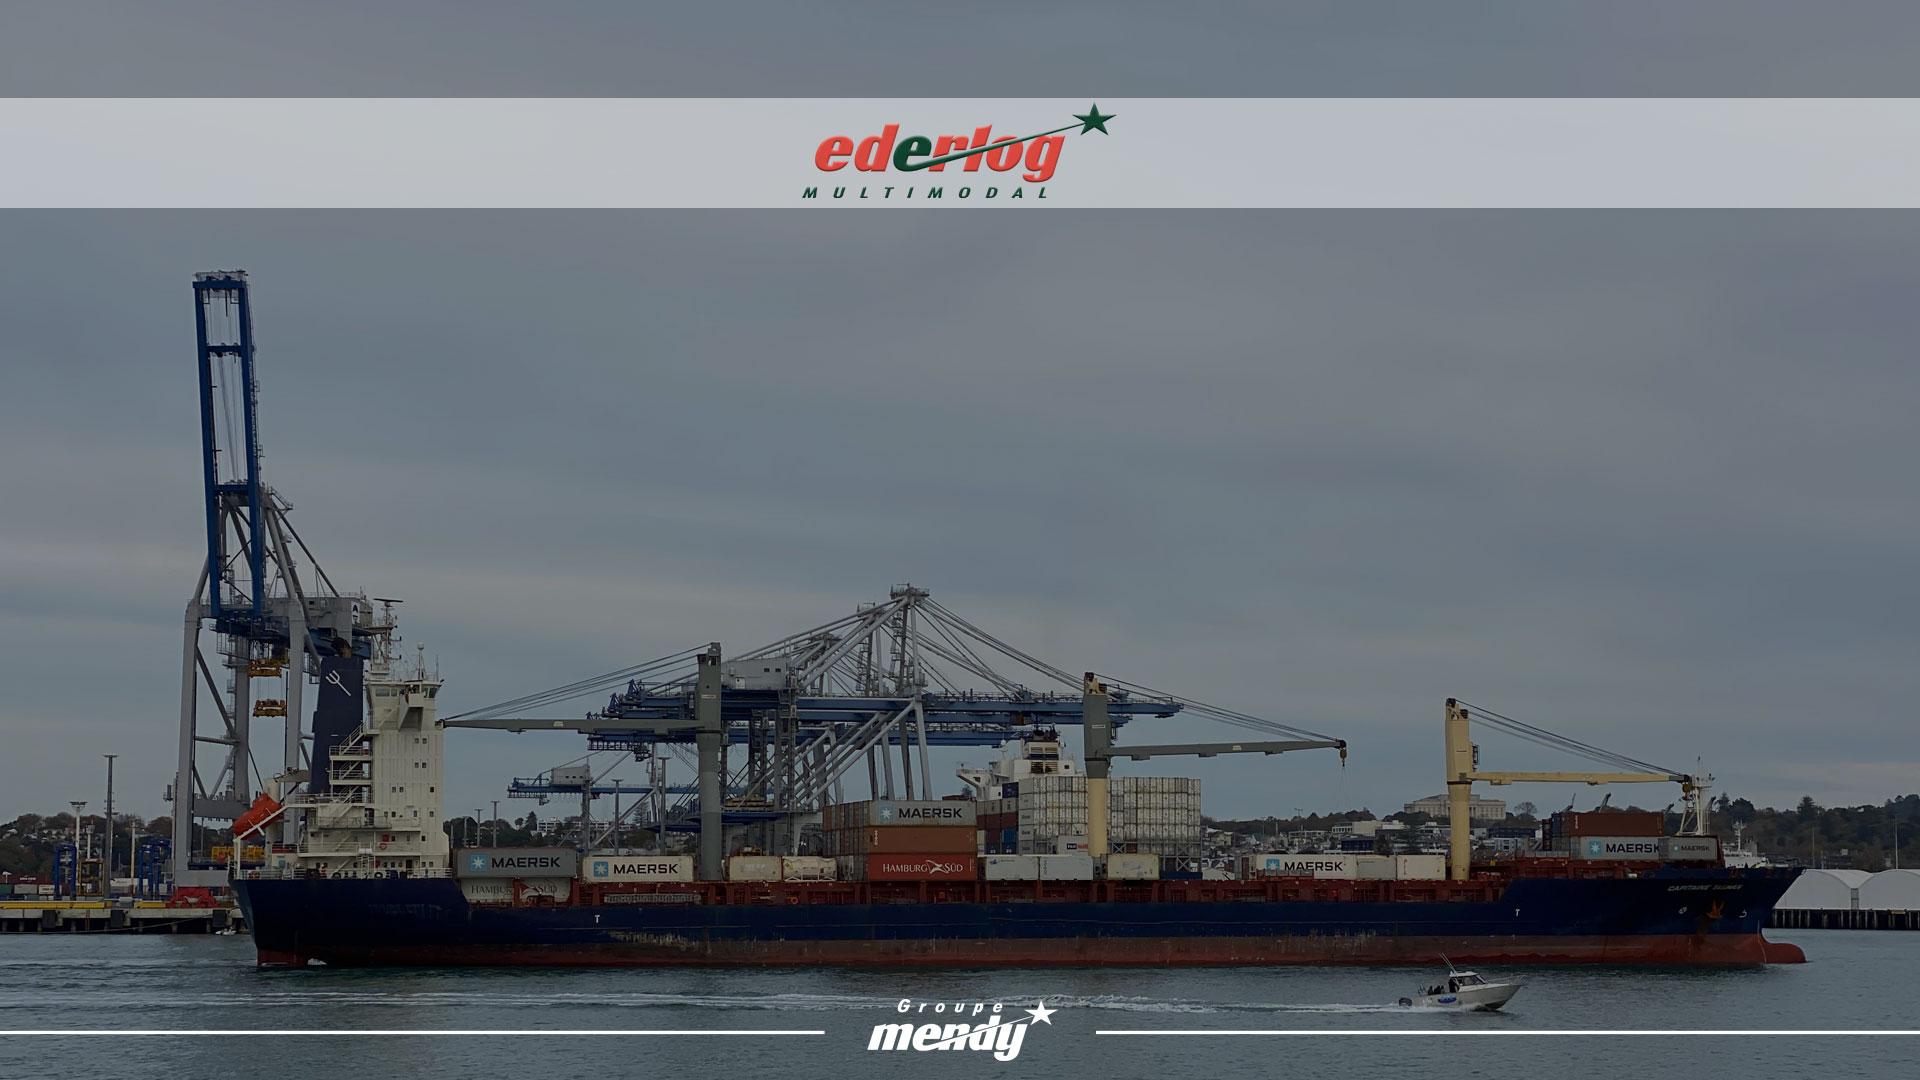 Ederlog : transport maritime